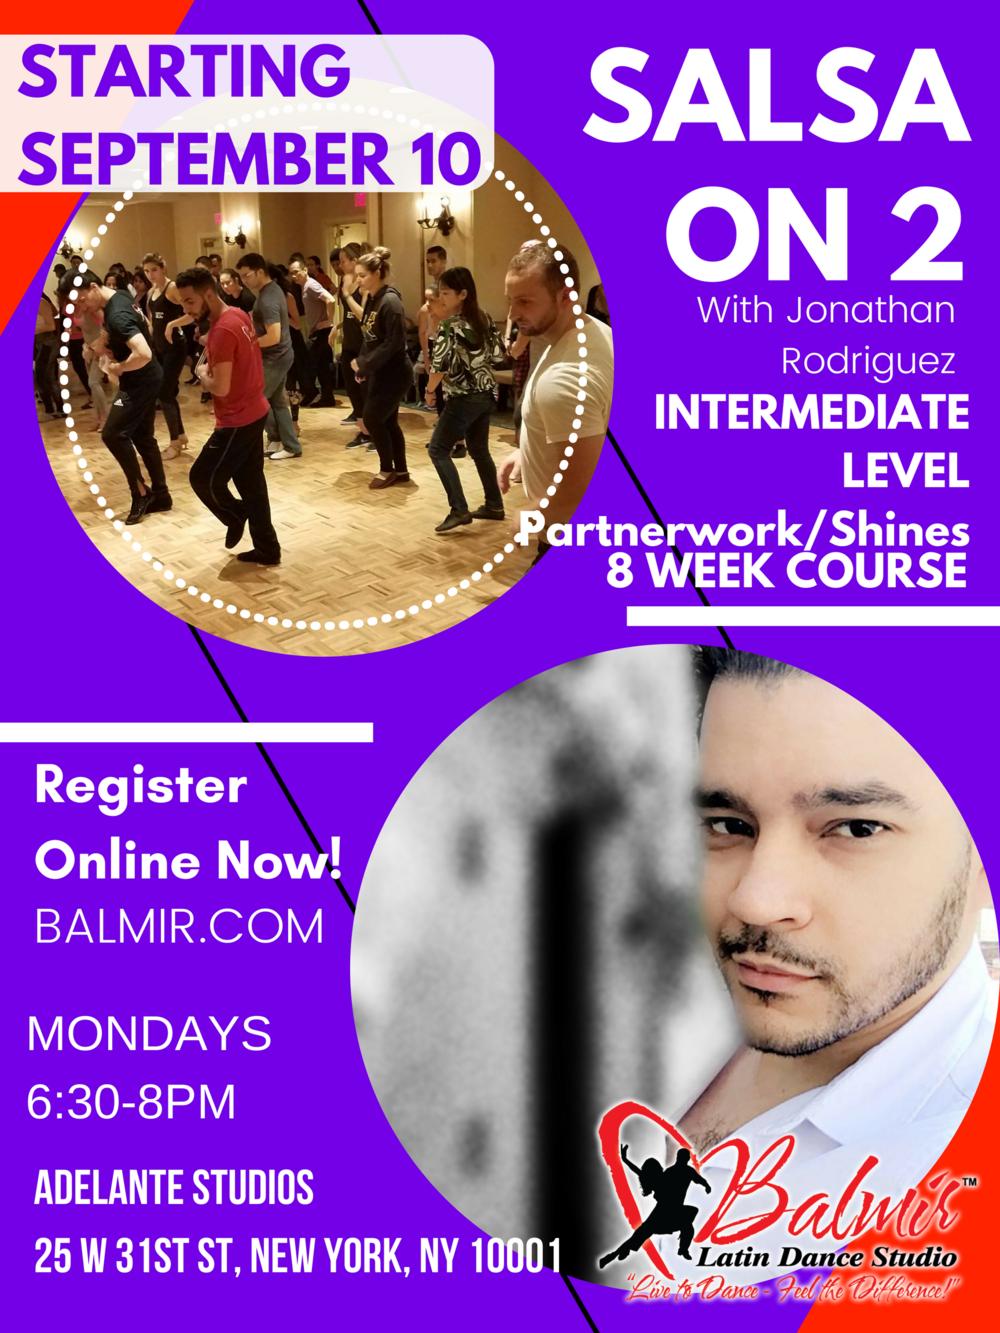 DANCE CLASS SALSA ON 2 INTERMEDIATE LEVEL BROOKLYN NYC BALMIR.COM.png